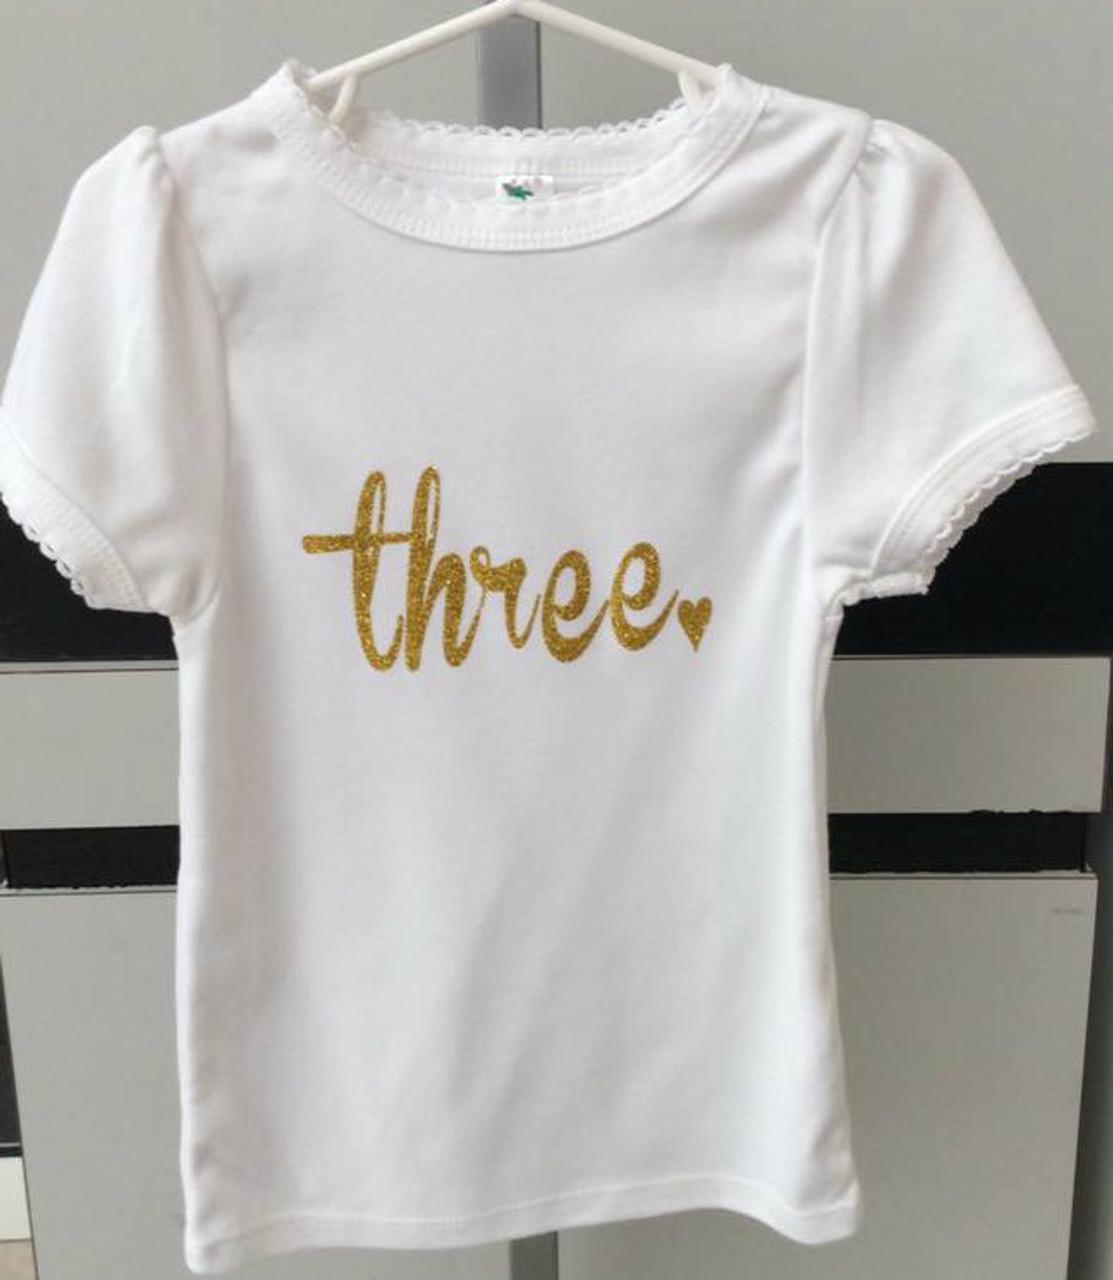 Girl S Three Shirt Girl S Third Birthday Shirt Girl S Birthday Shirt Third Birthday Outfit Third Birthday Girl S Shirts Toddler Birthday Shirts Sissy S Bags Boutique